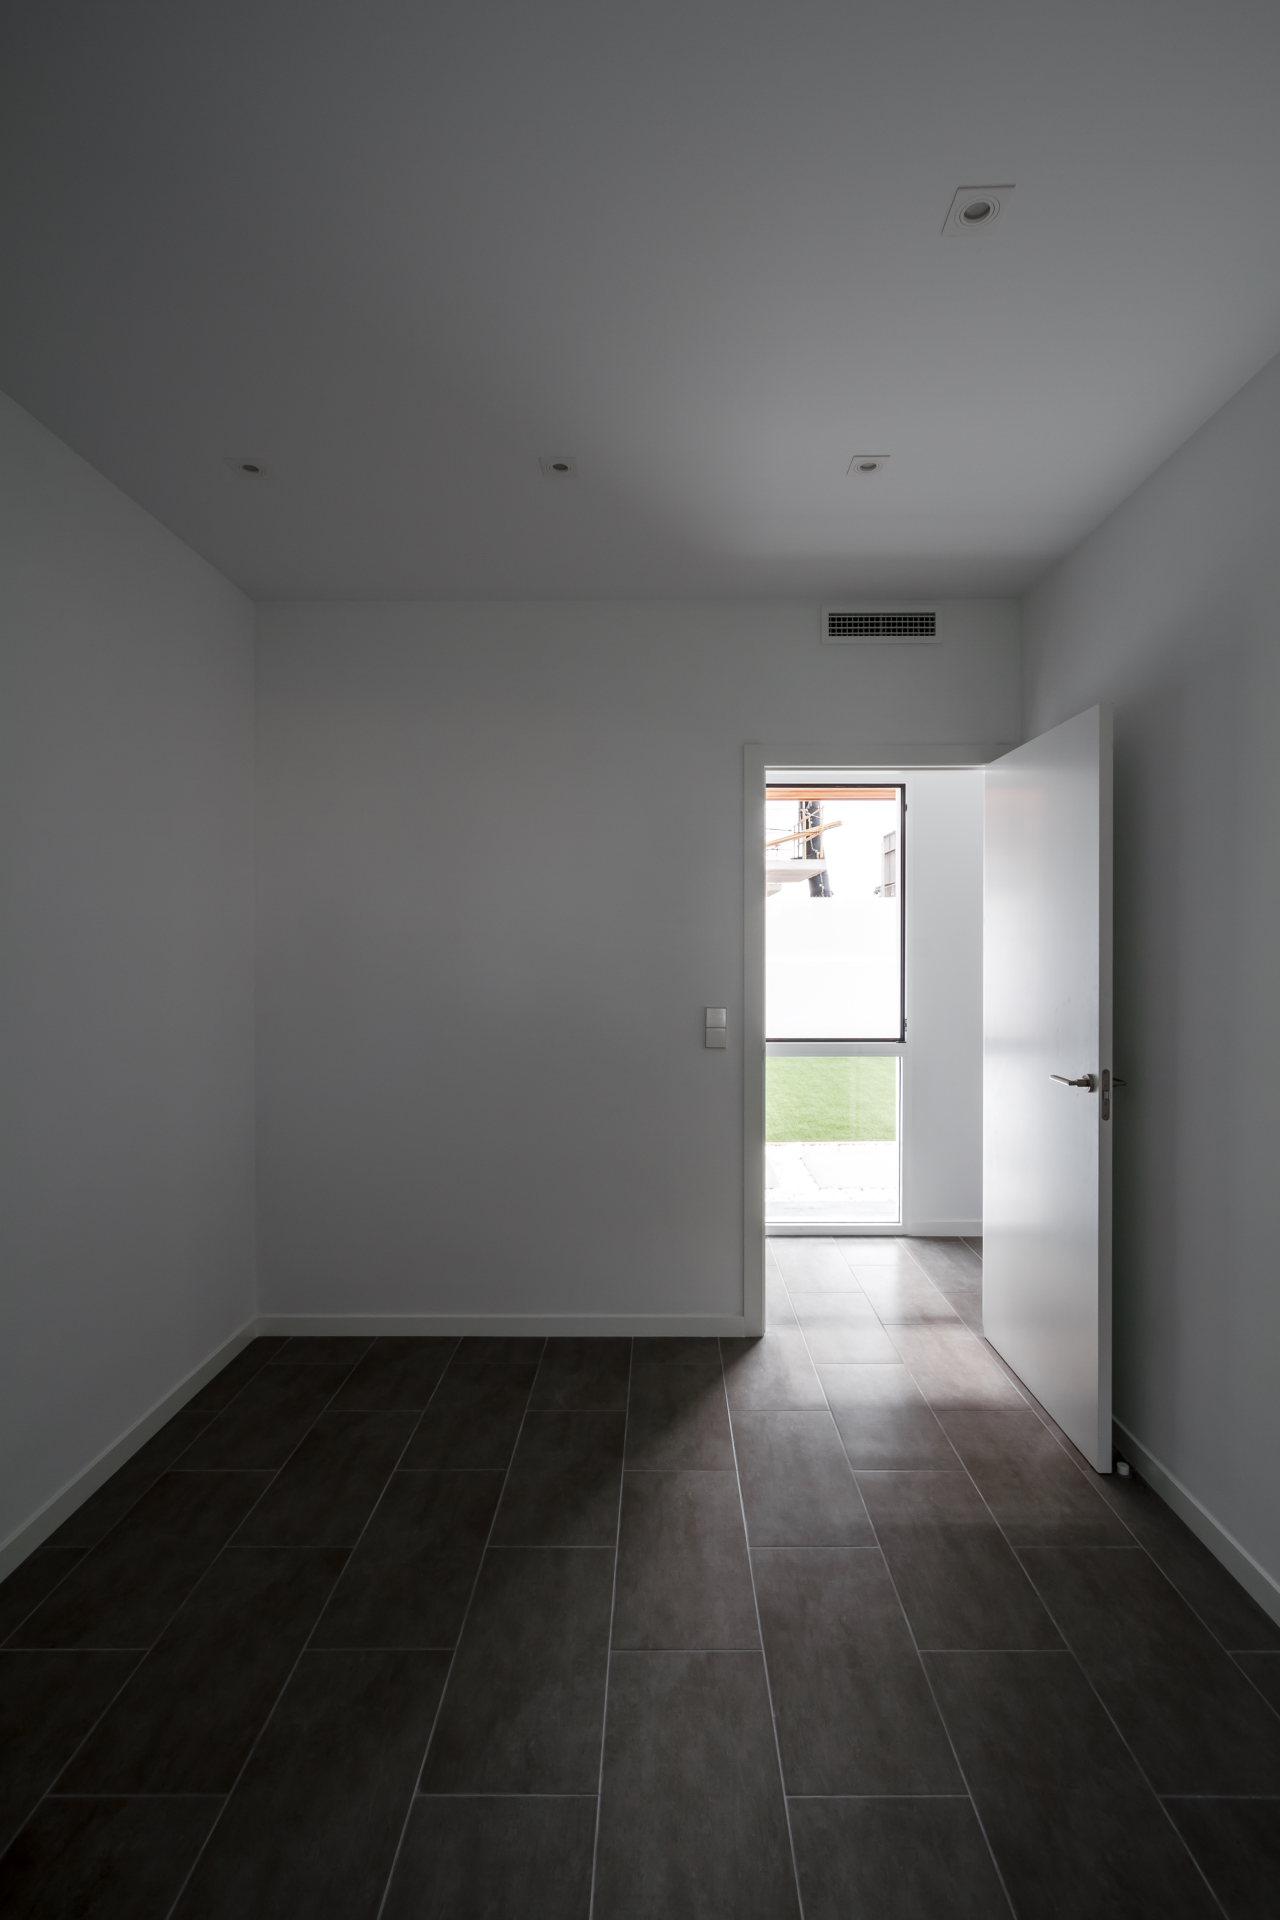 fotografia-arquitectura-valencia-german-cabo-viraje-museros (13)